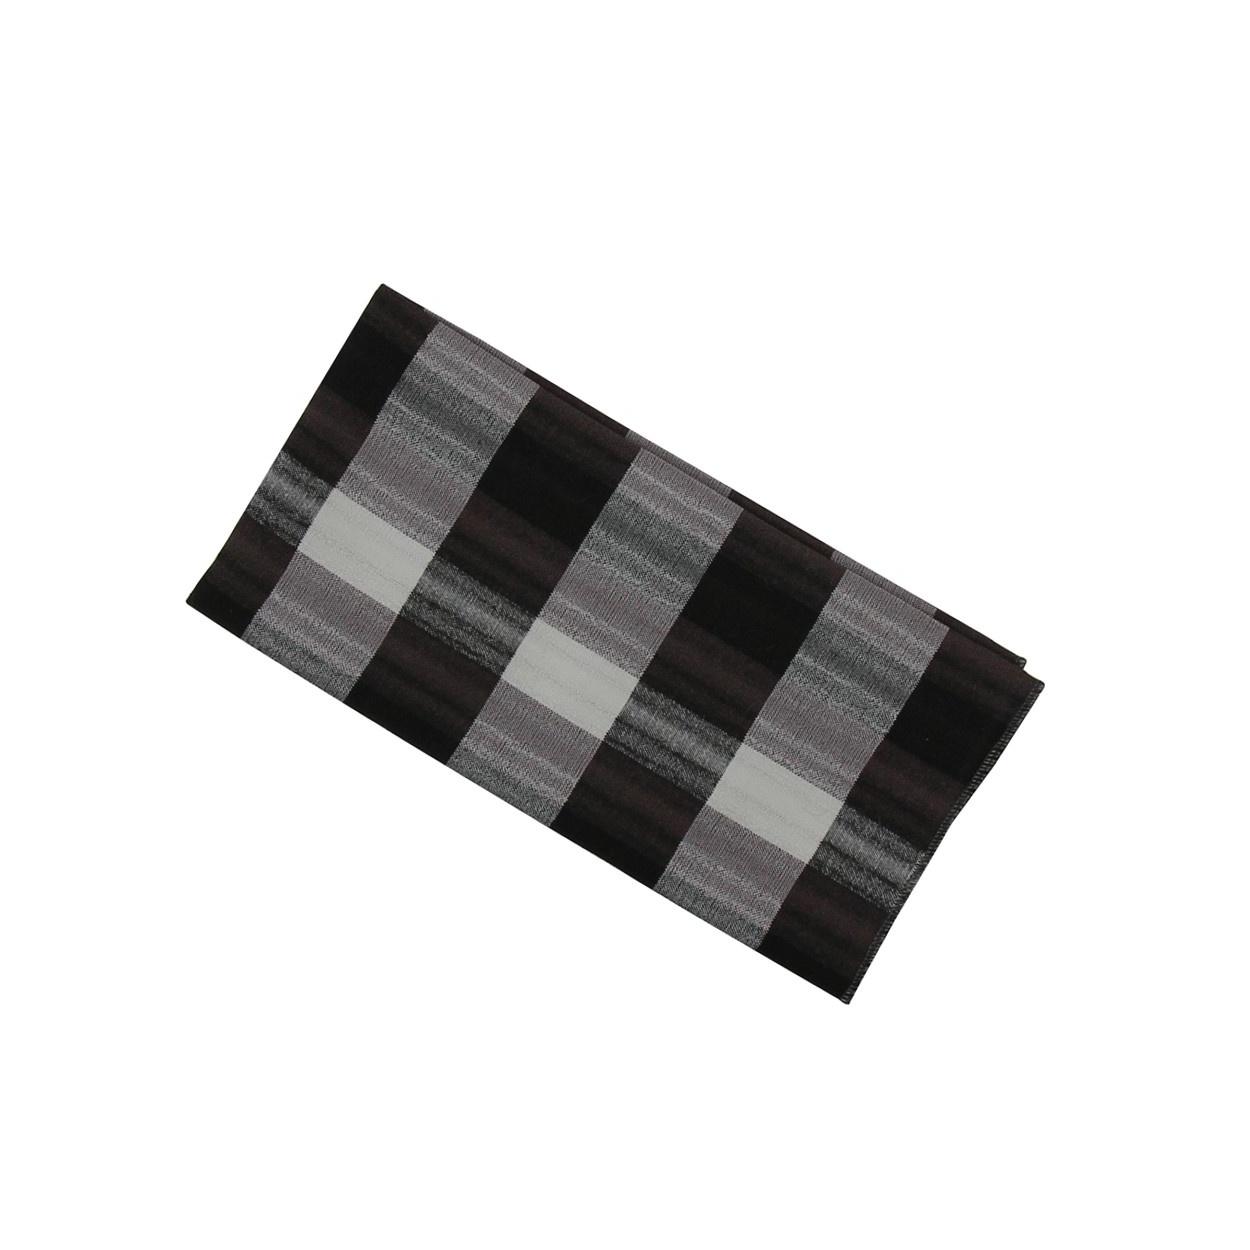 Šedo černý pánský kapesníček do saka s kostkovaným vzorem